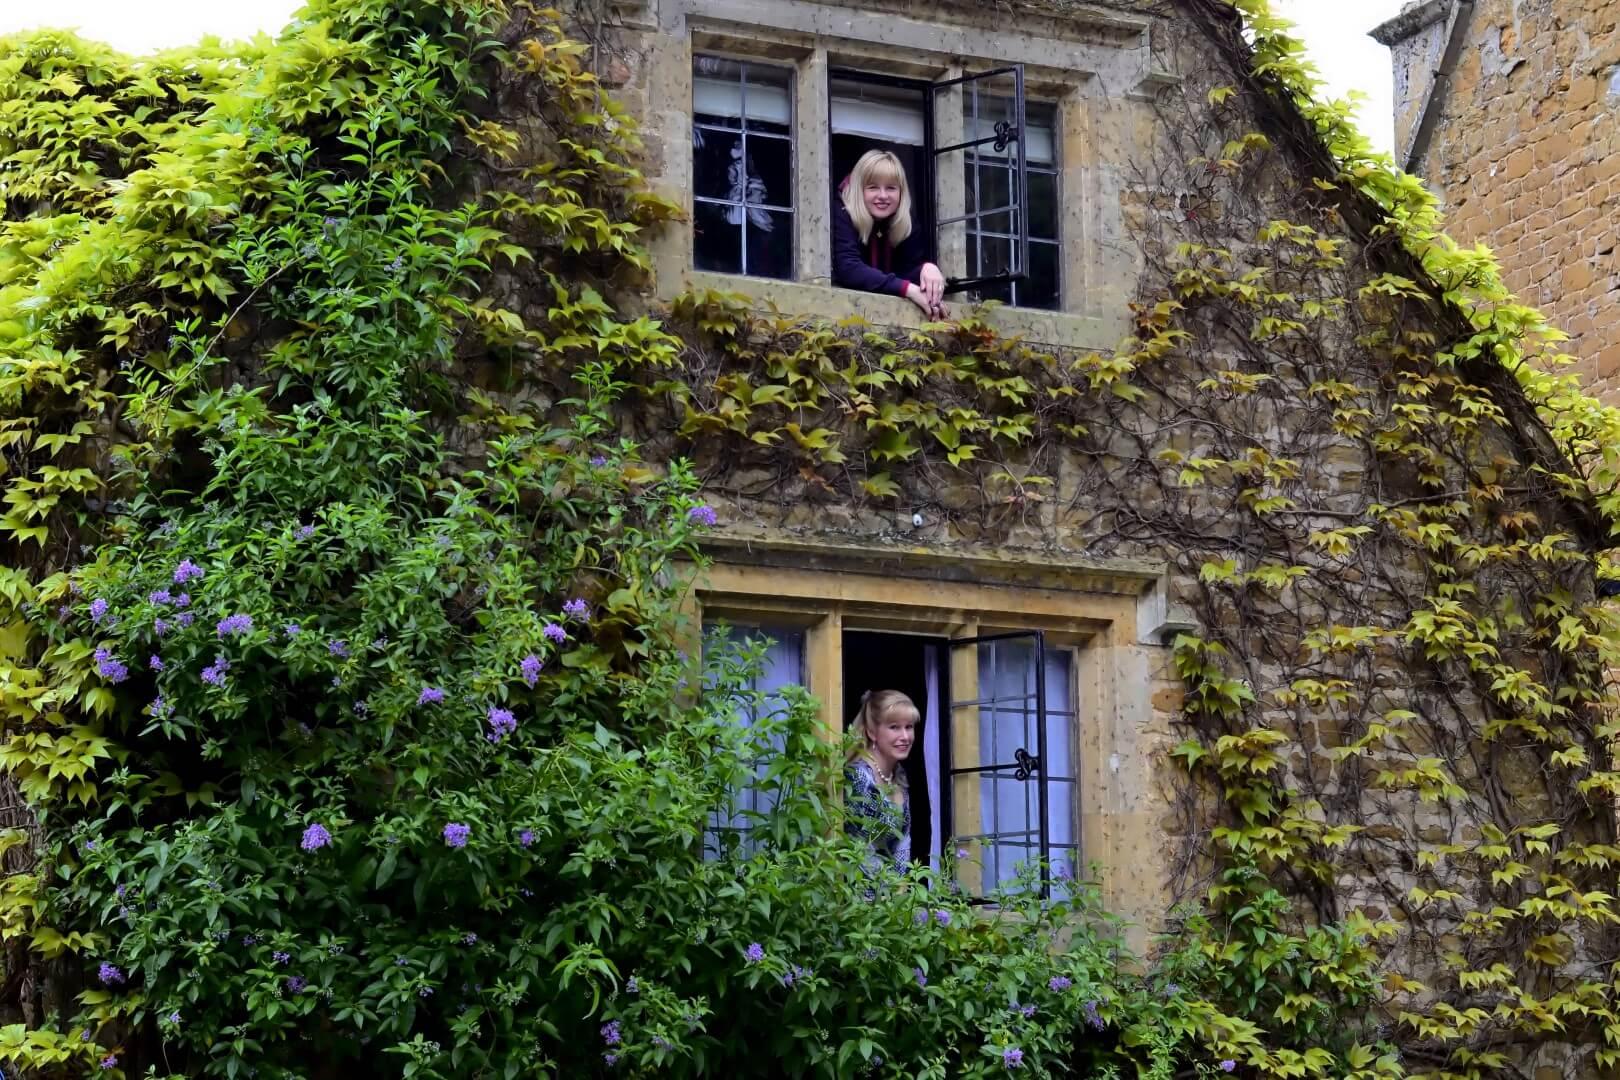 Kathy and LeAnn - Charingworth windows